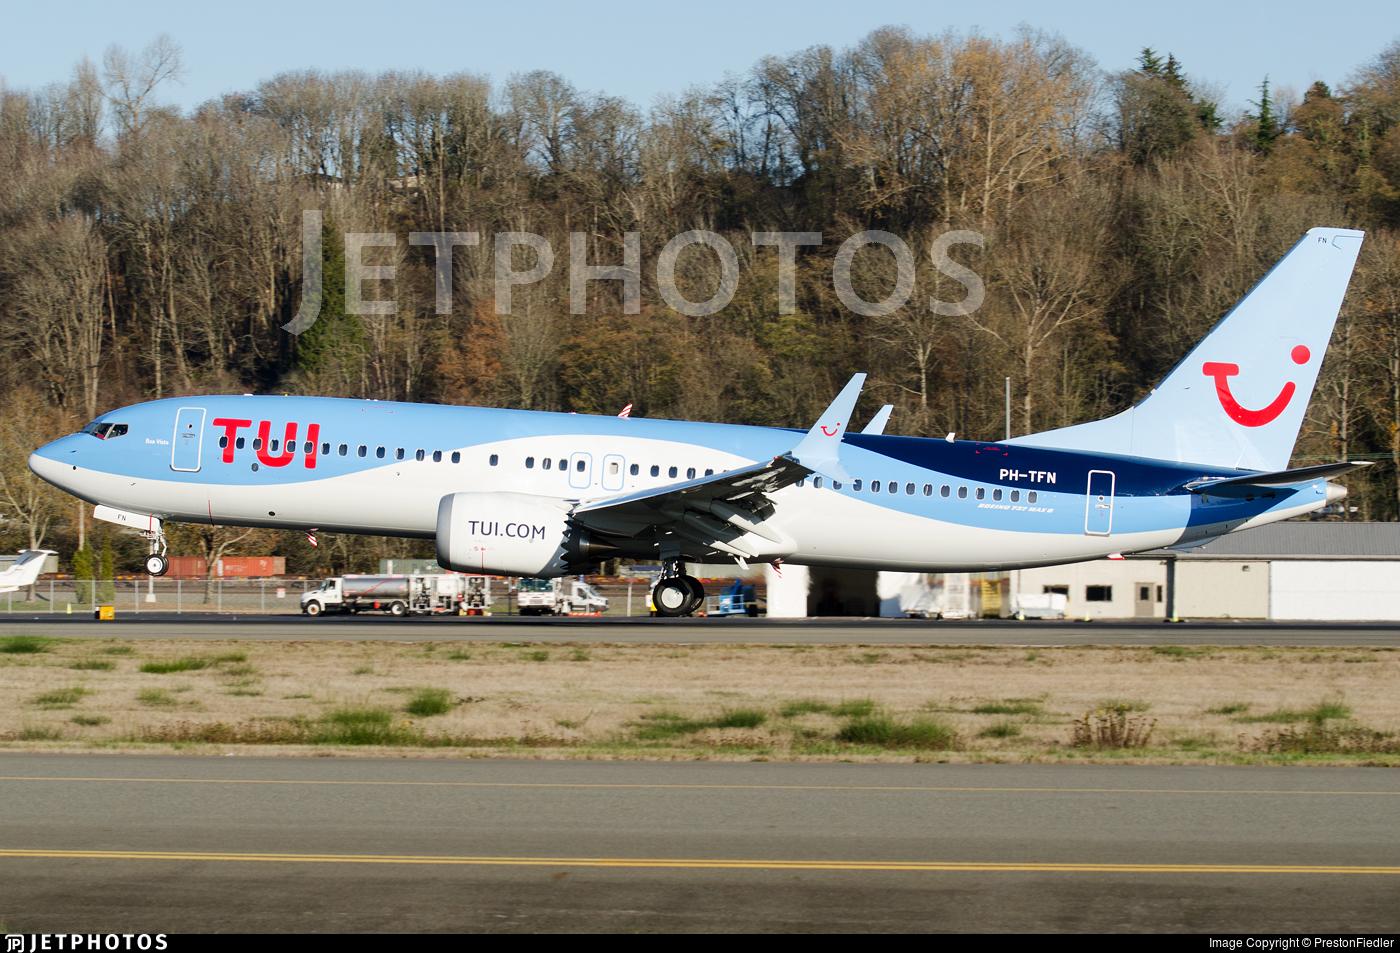 PH-TFN | Boeing 737-8 MAX | TUI | PrestonFiedler | JetPhotos